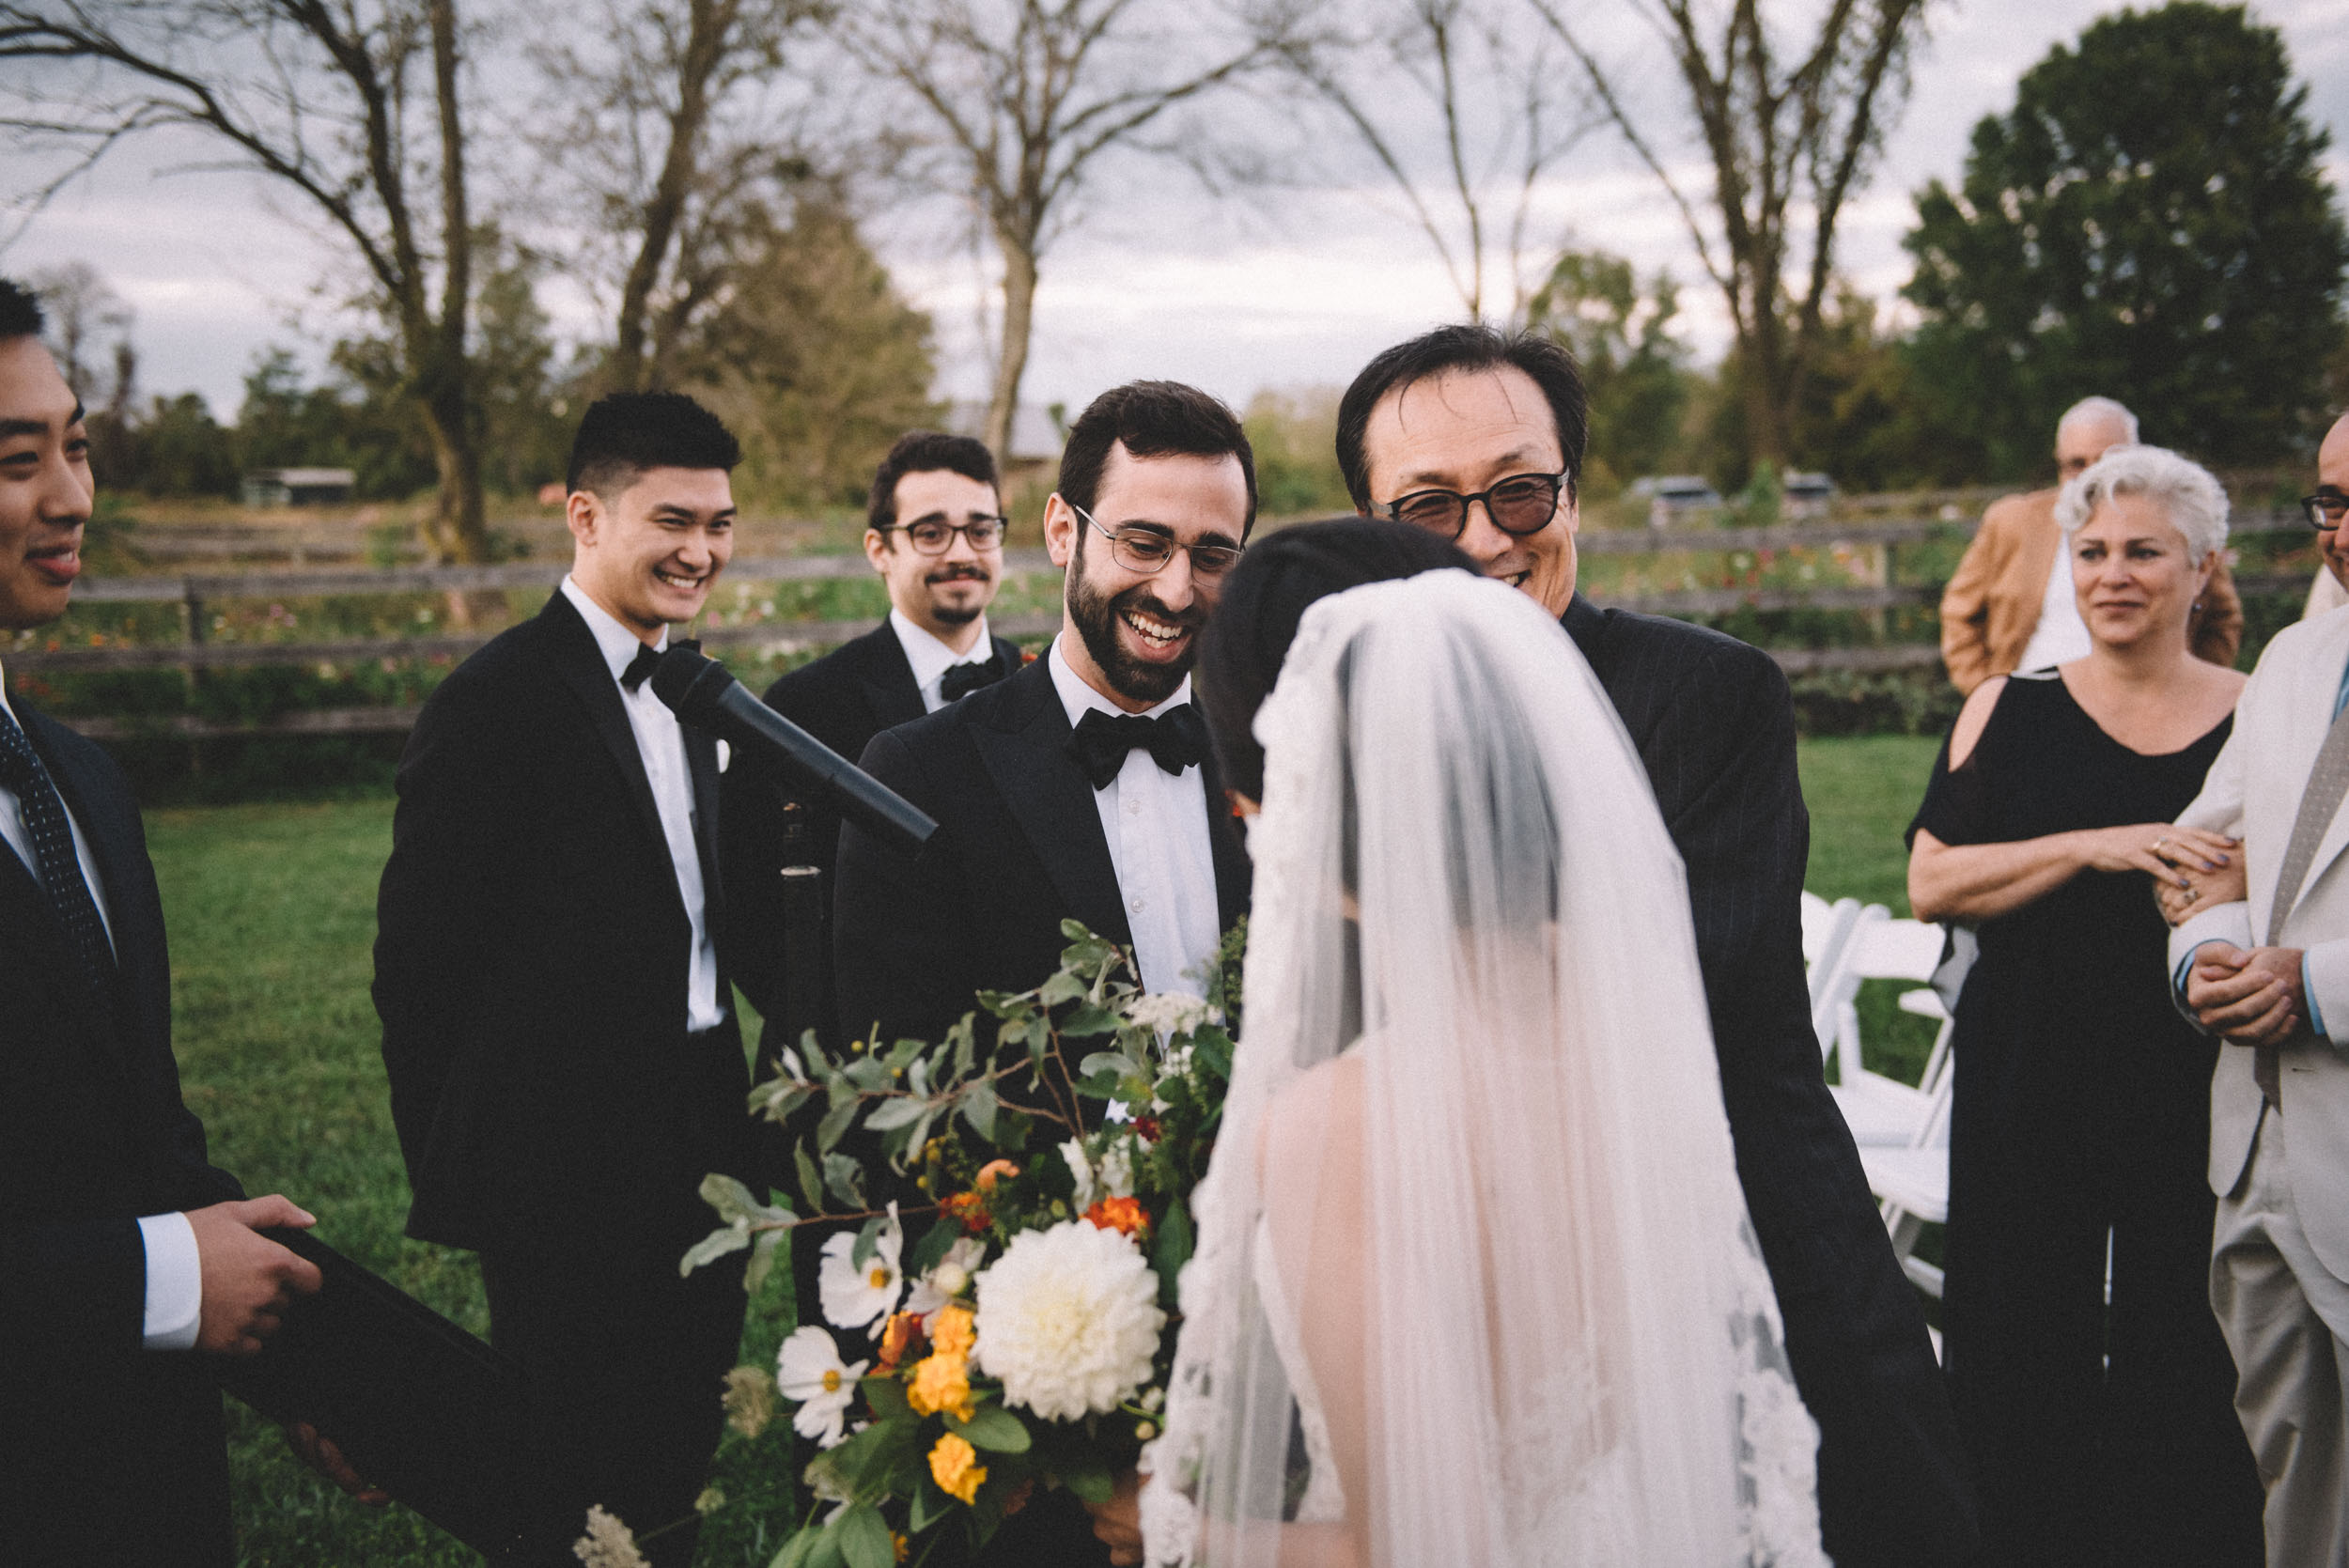 poolseville-maryland-wedding-photographer-42.jpg